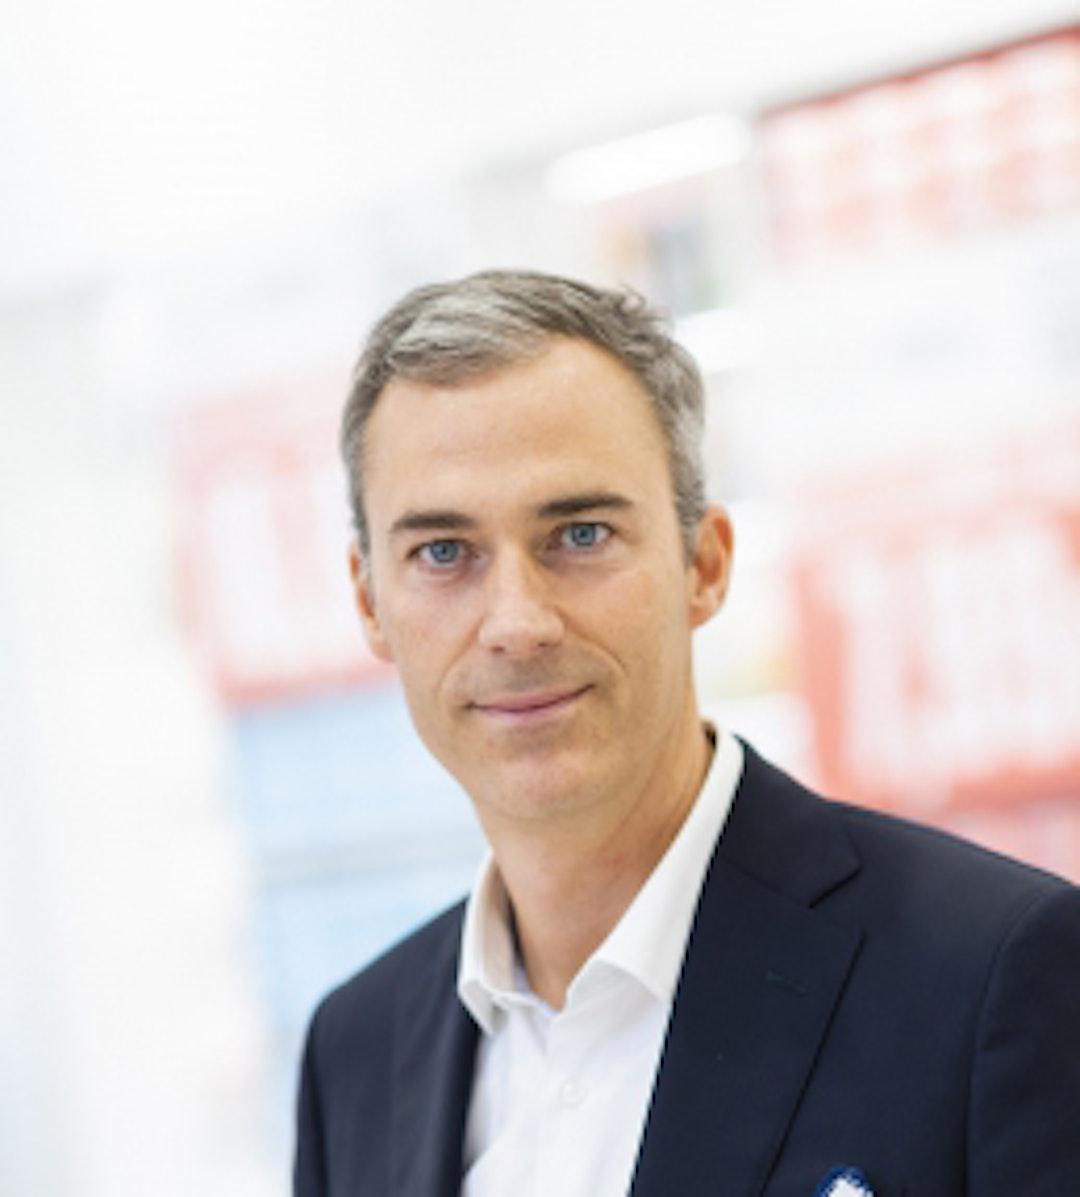 Interview avec le CEO Yvan Verougstraete